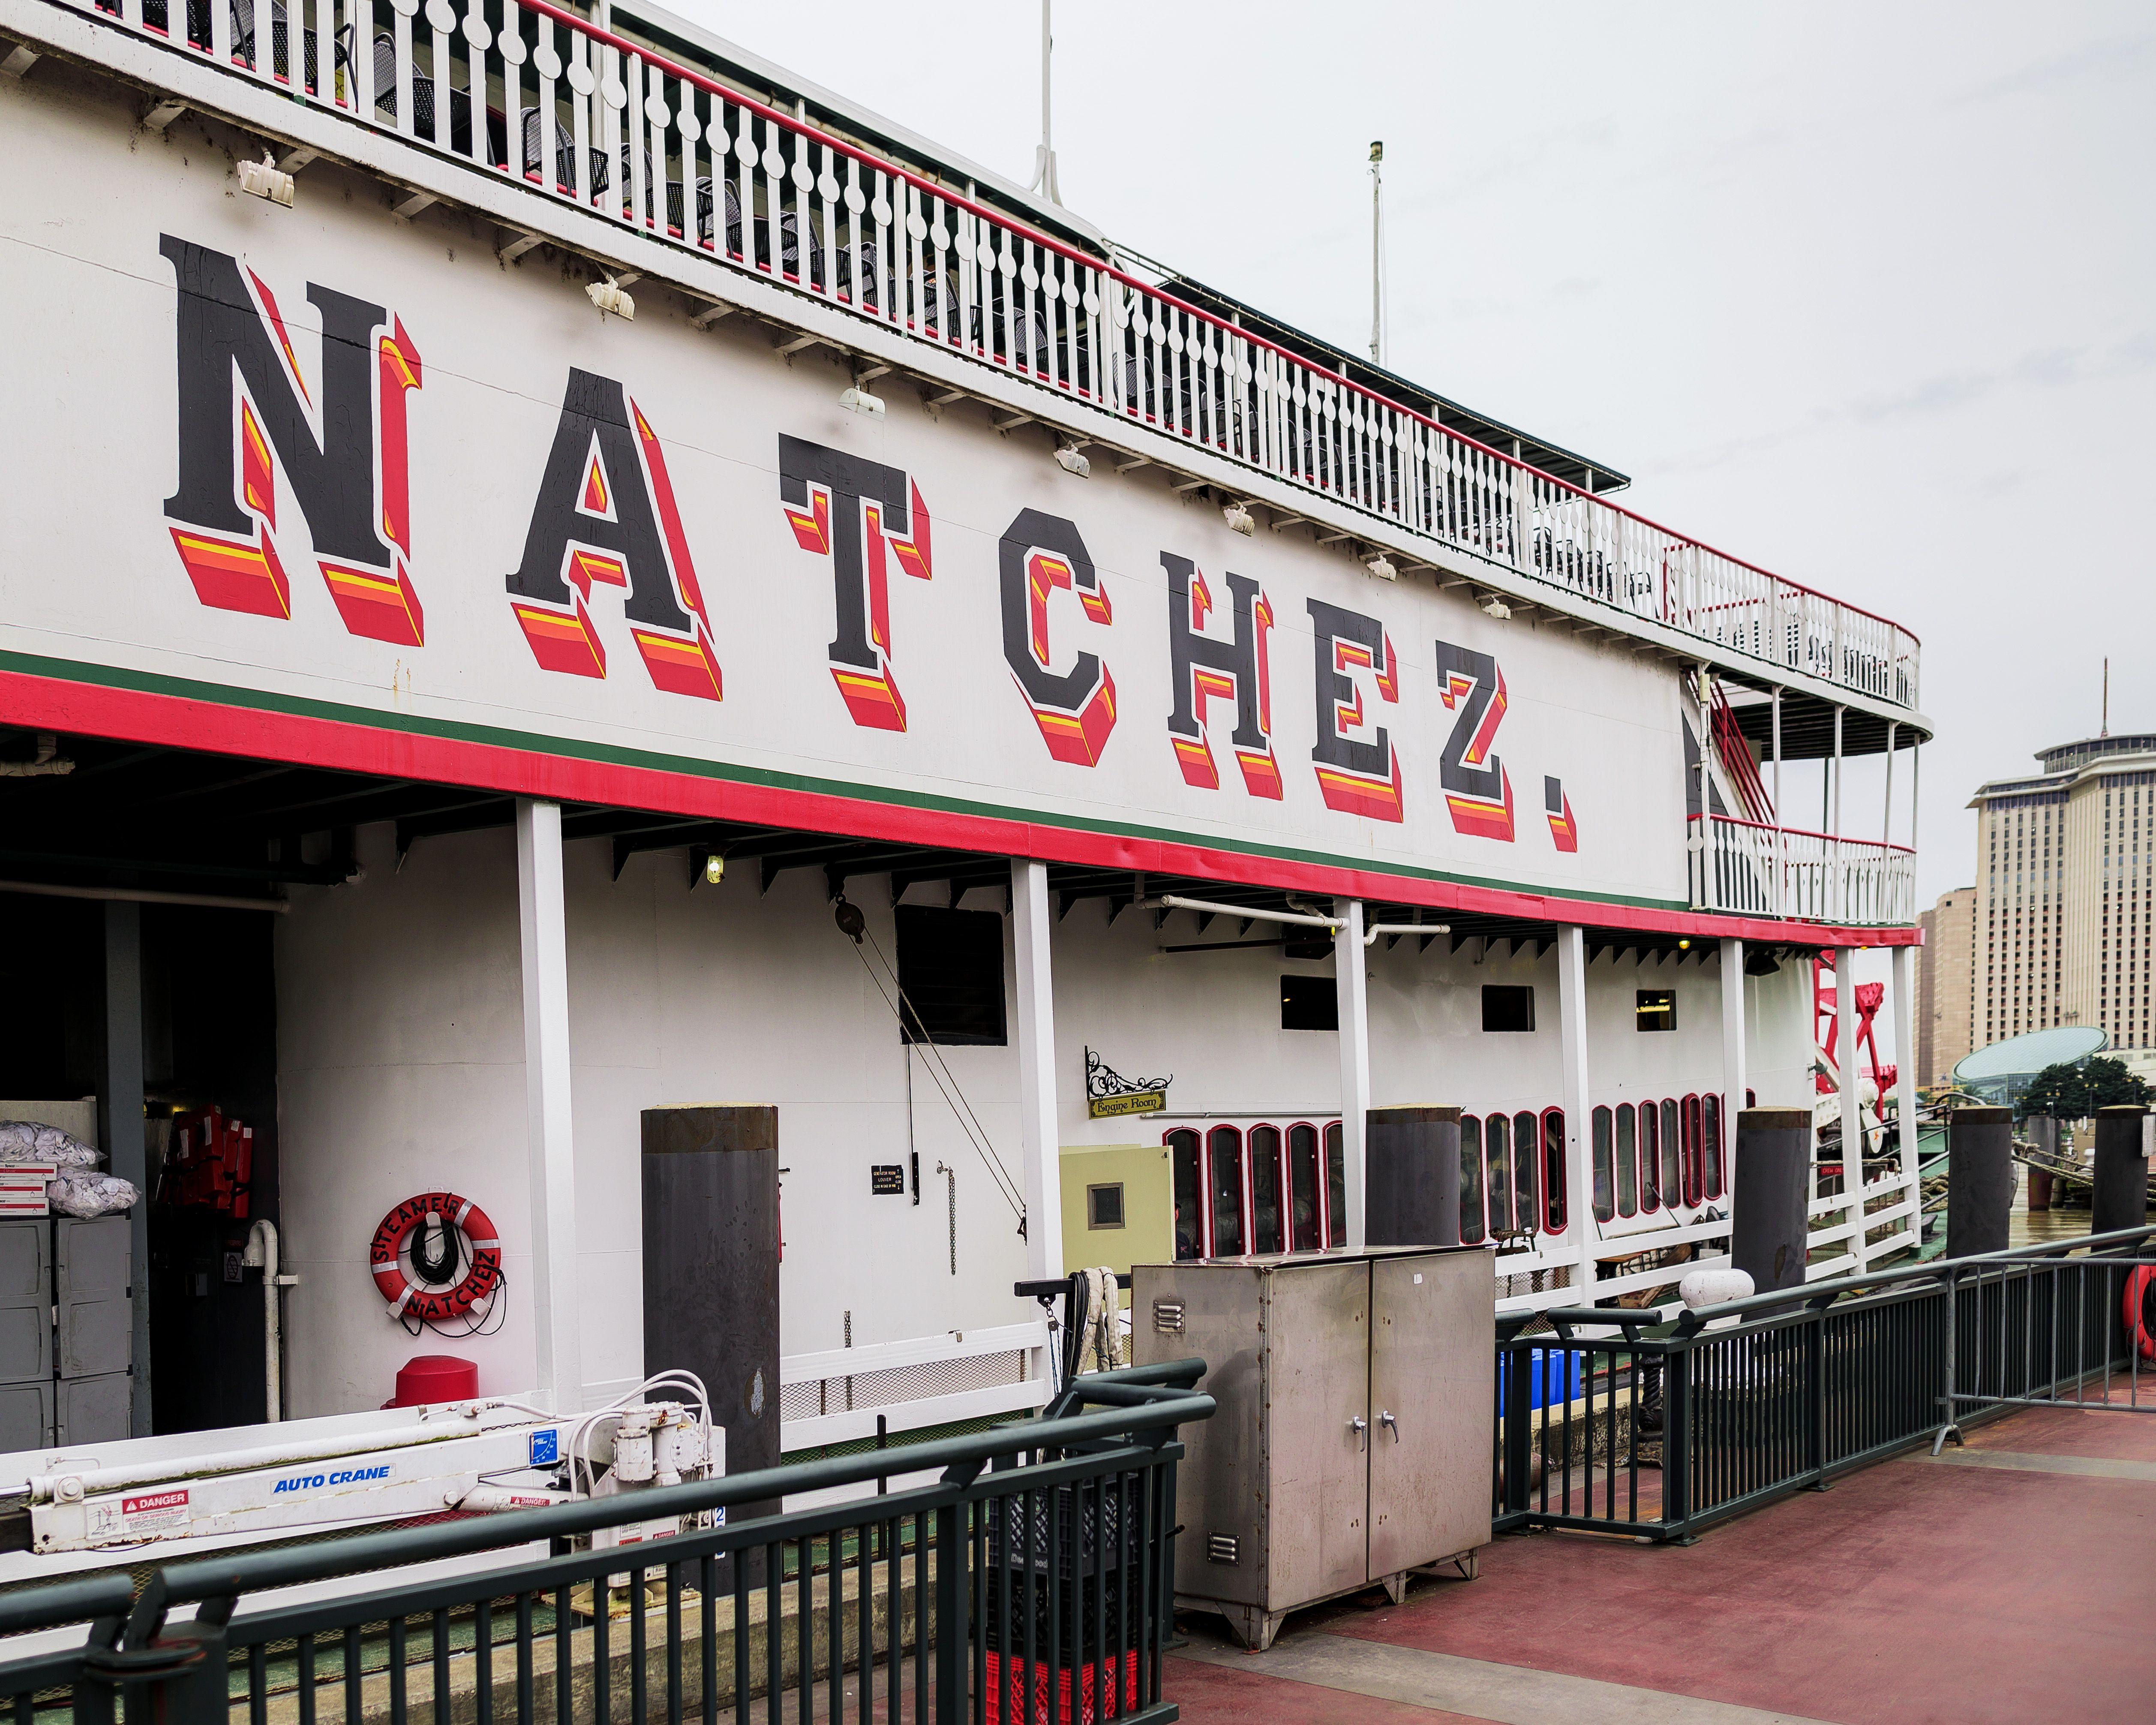 Natchez Boat